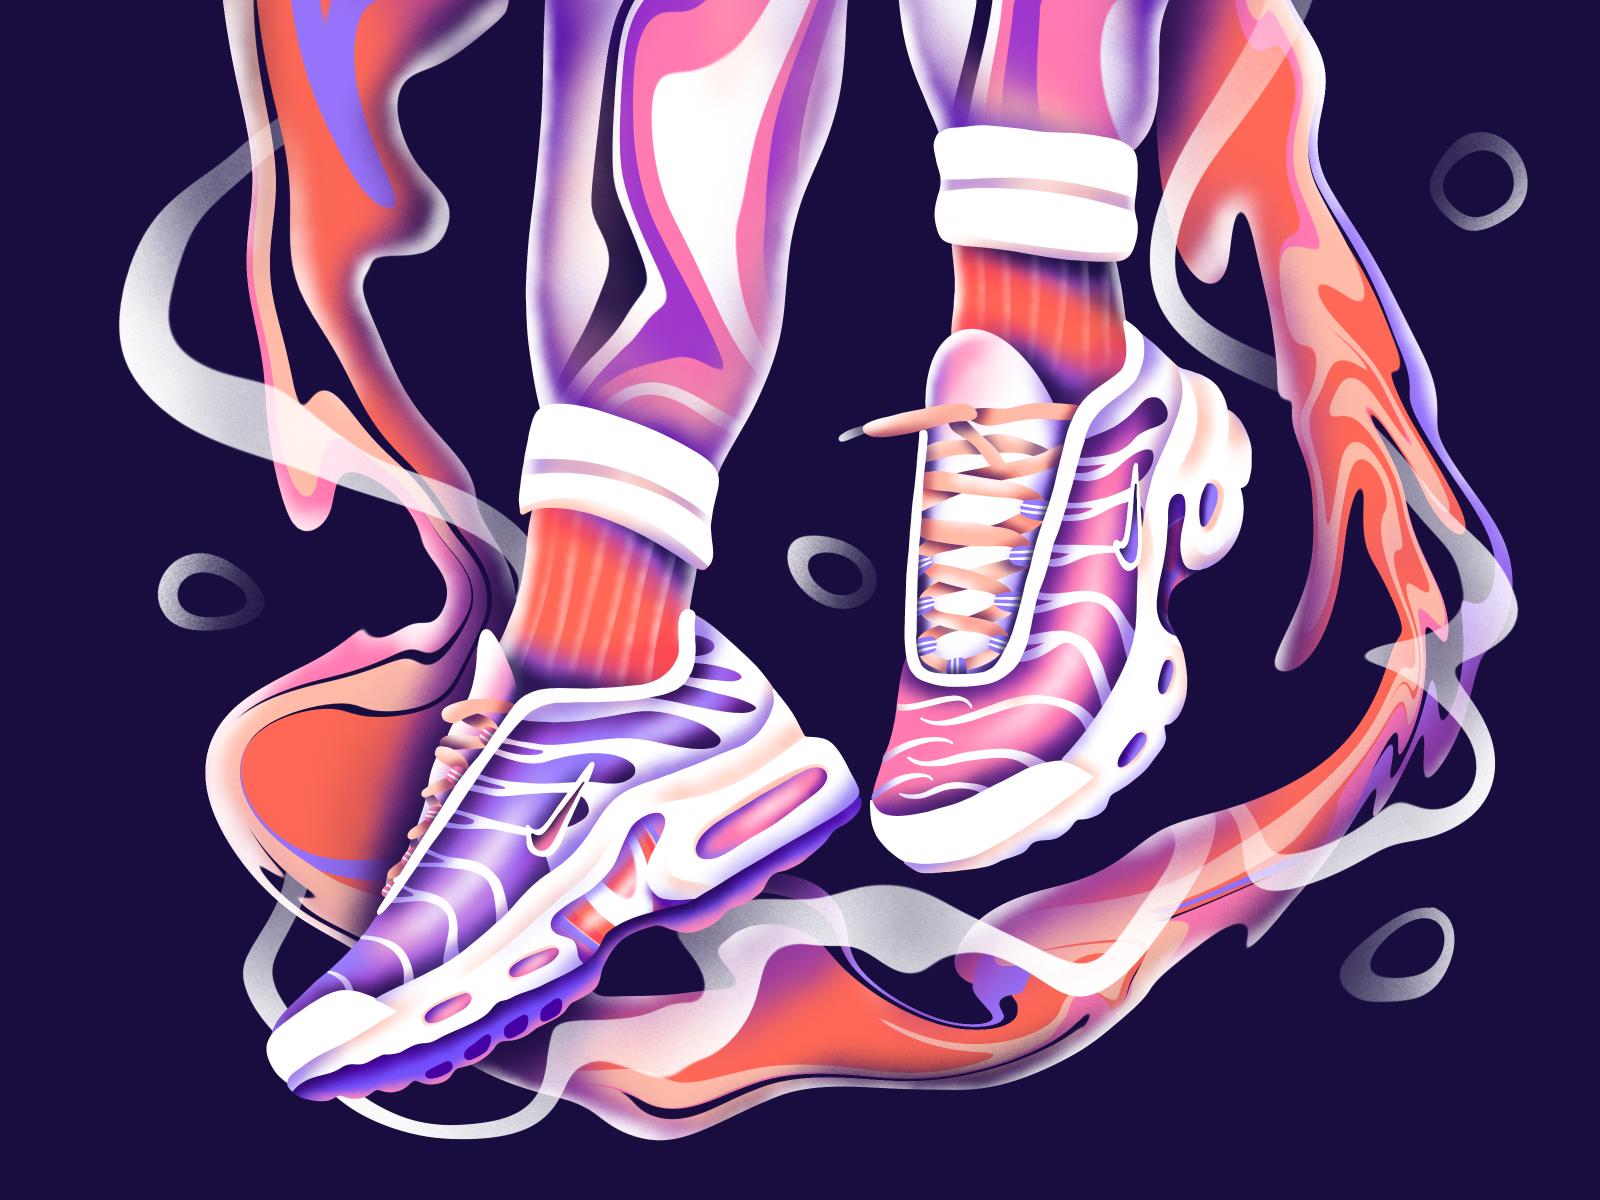 Nike tn, Nike art, Design inspiration